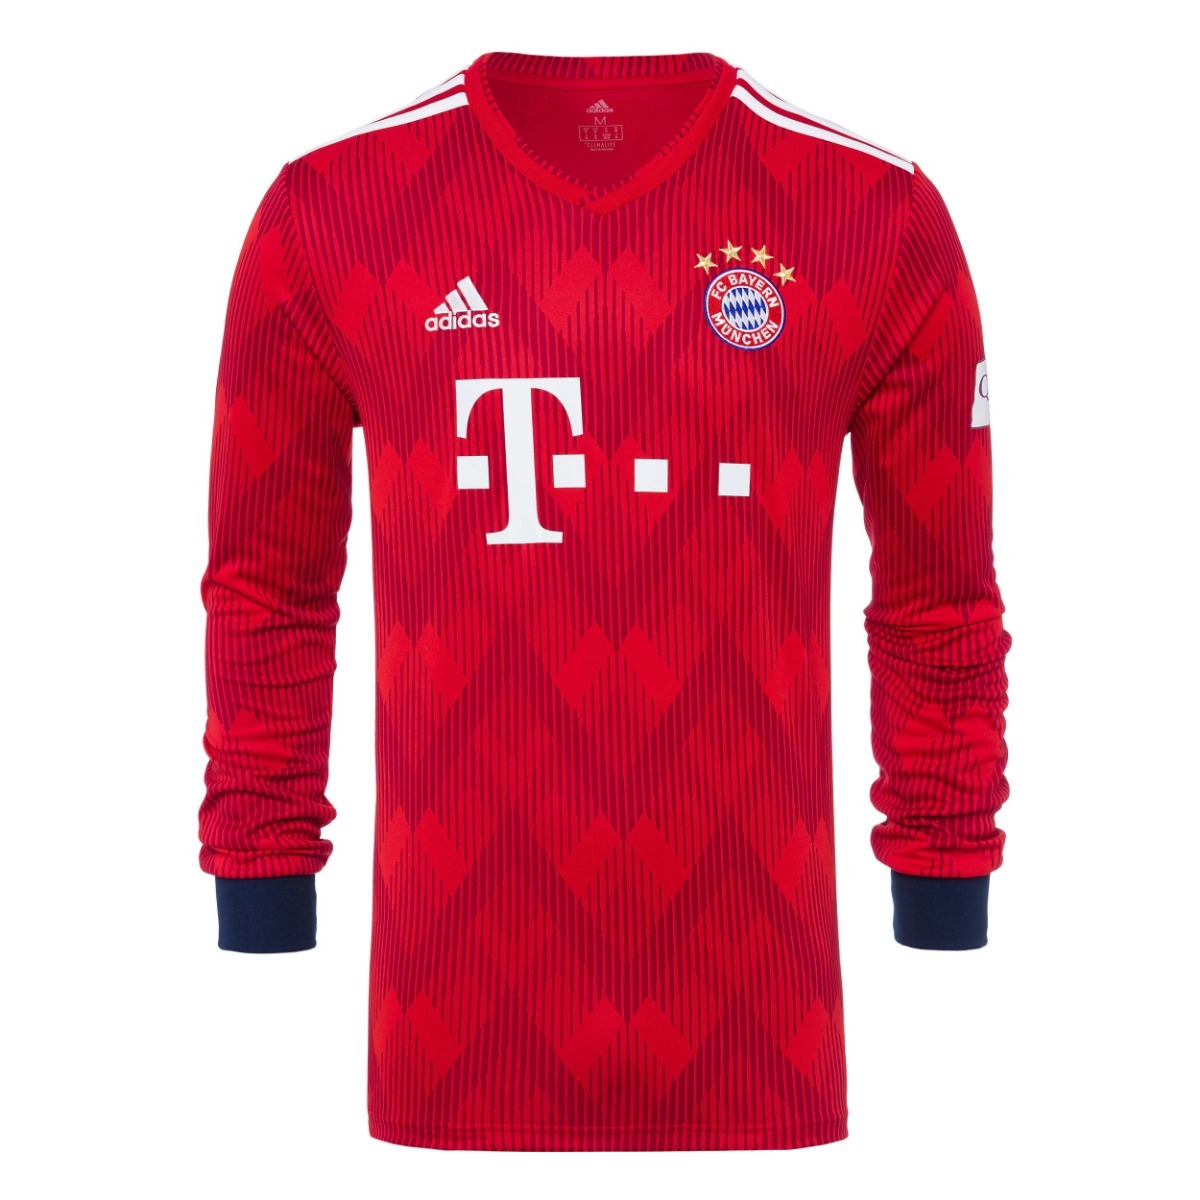 Bayern Munique - Unif 1 Manga Longa - 18   19 - Frete Grátis - R ... 1231d0edcba50